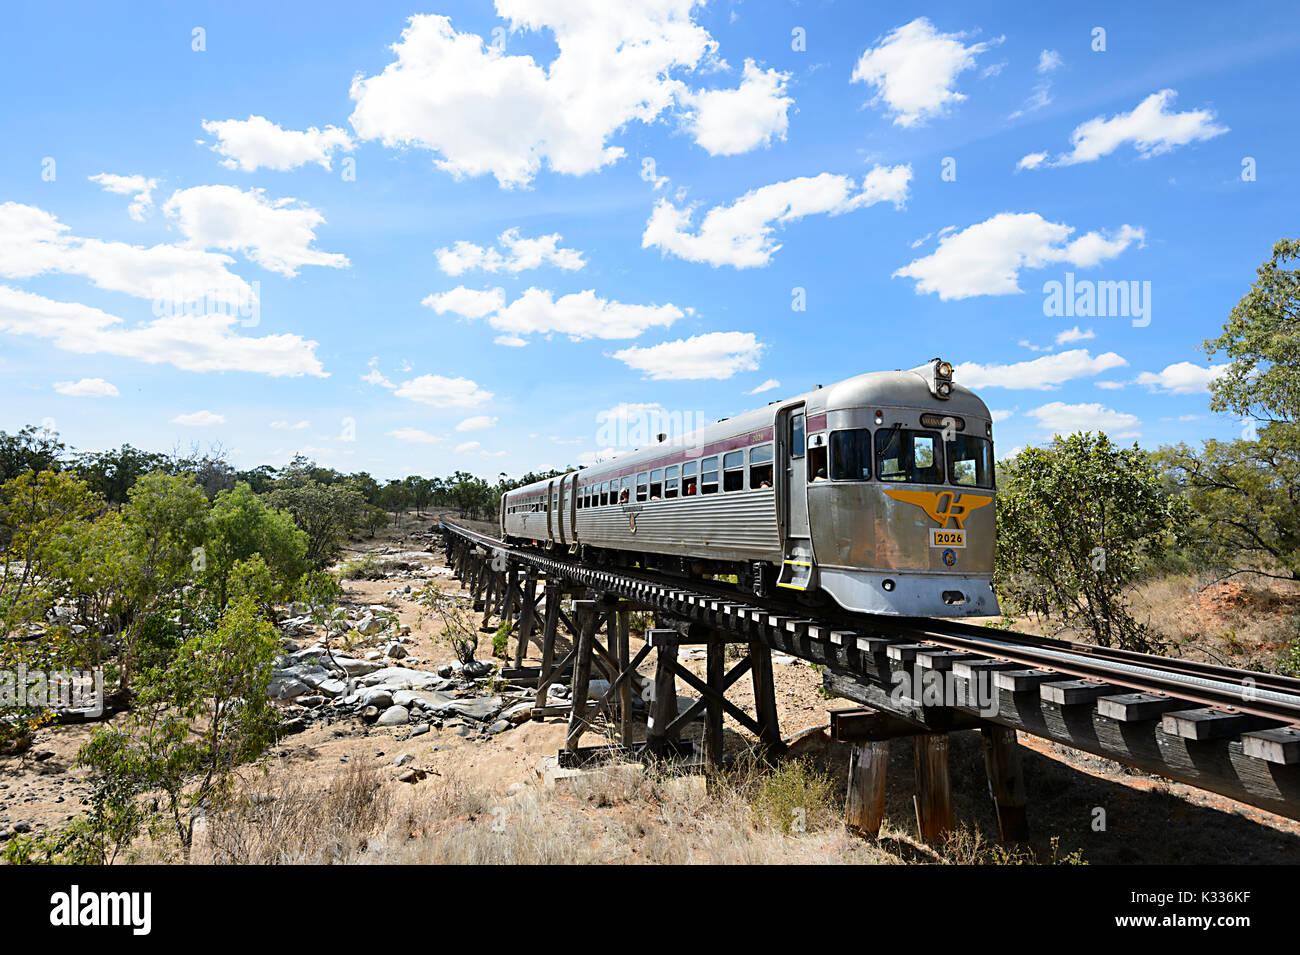 historical-savannahlander-train-going-ov